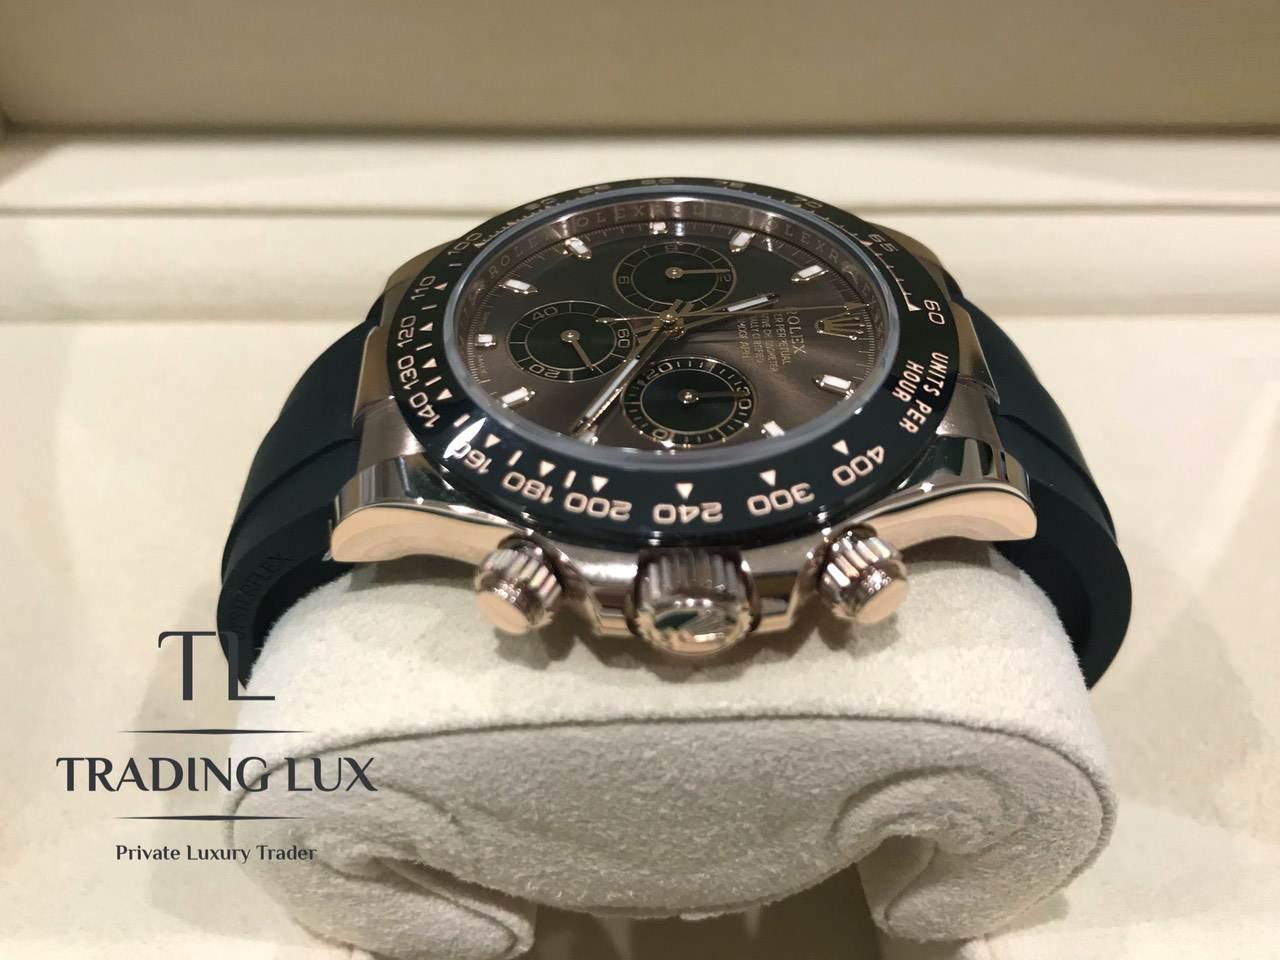 Rolex-Daytona-116515LN-Chocolate-7